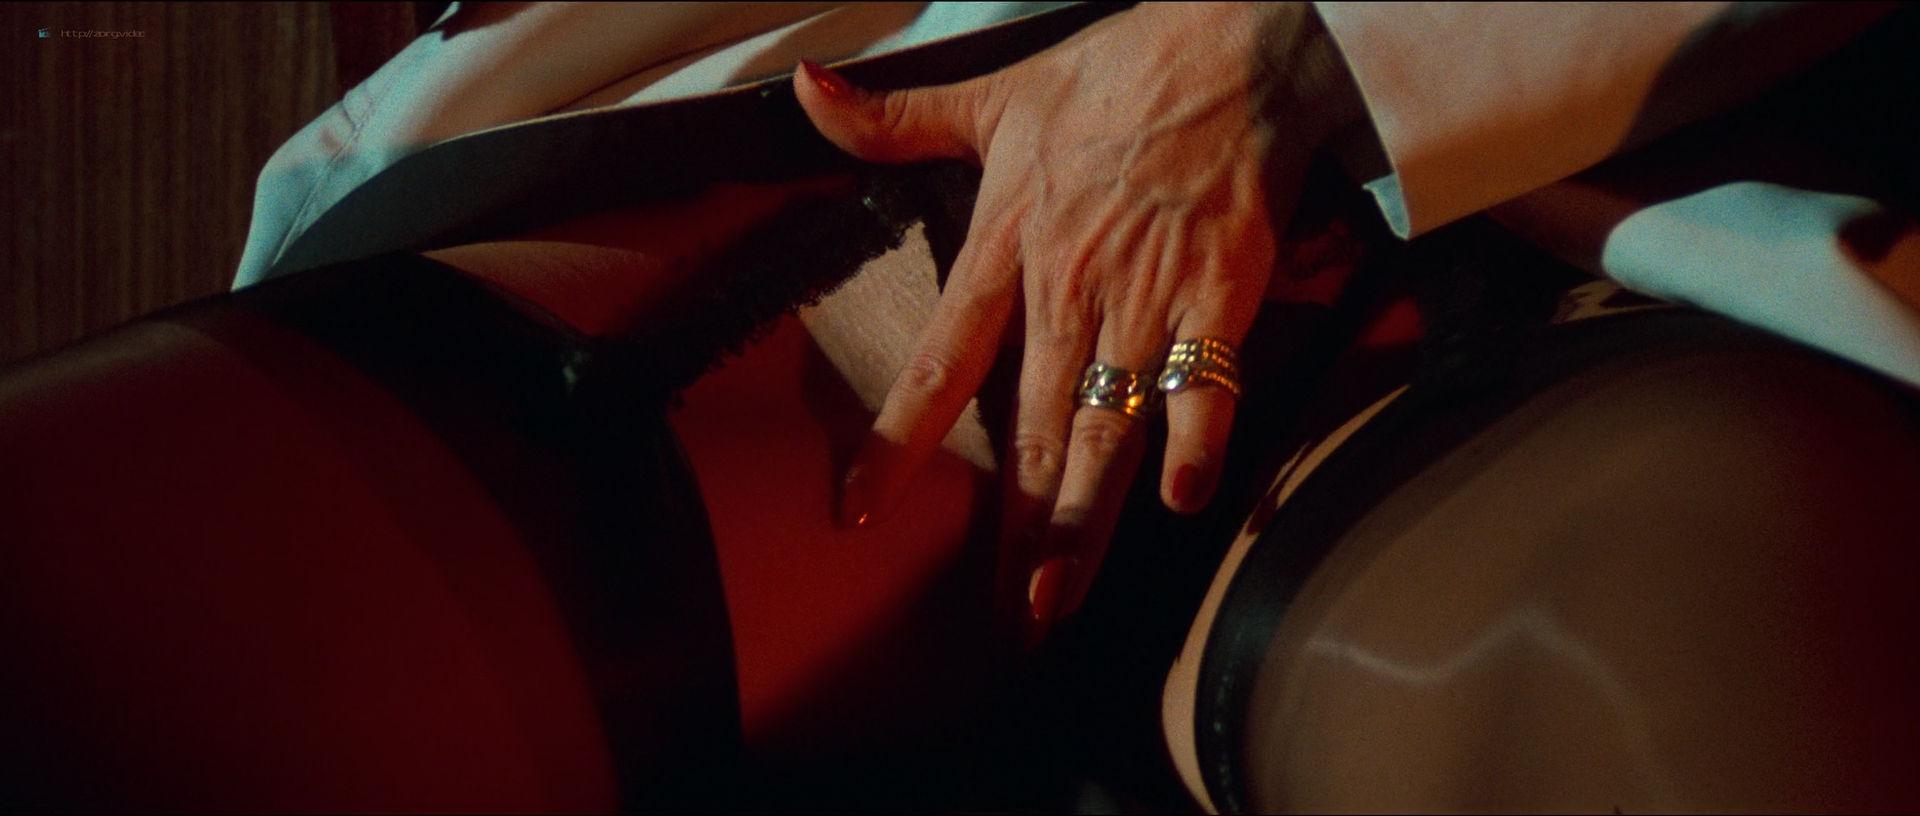 Daniela Doria nude full frontal Zora Kerova and other nude - The New York Ripper (IT-1982) HD 1080p BluRay(r) (12)